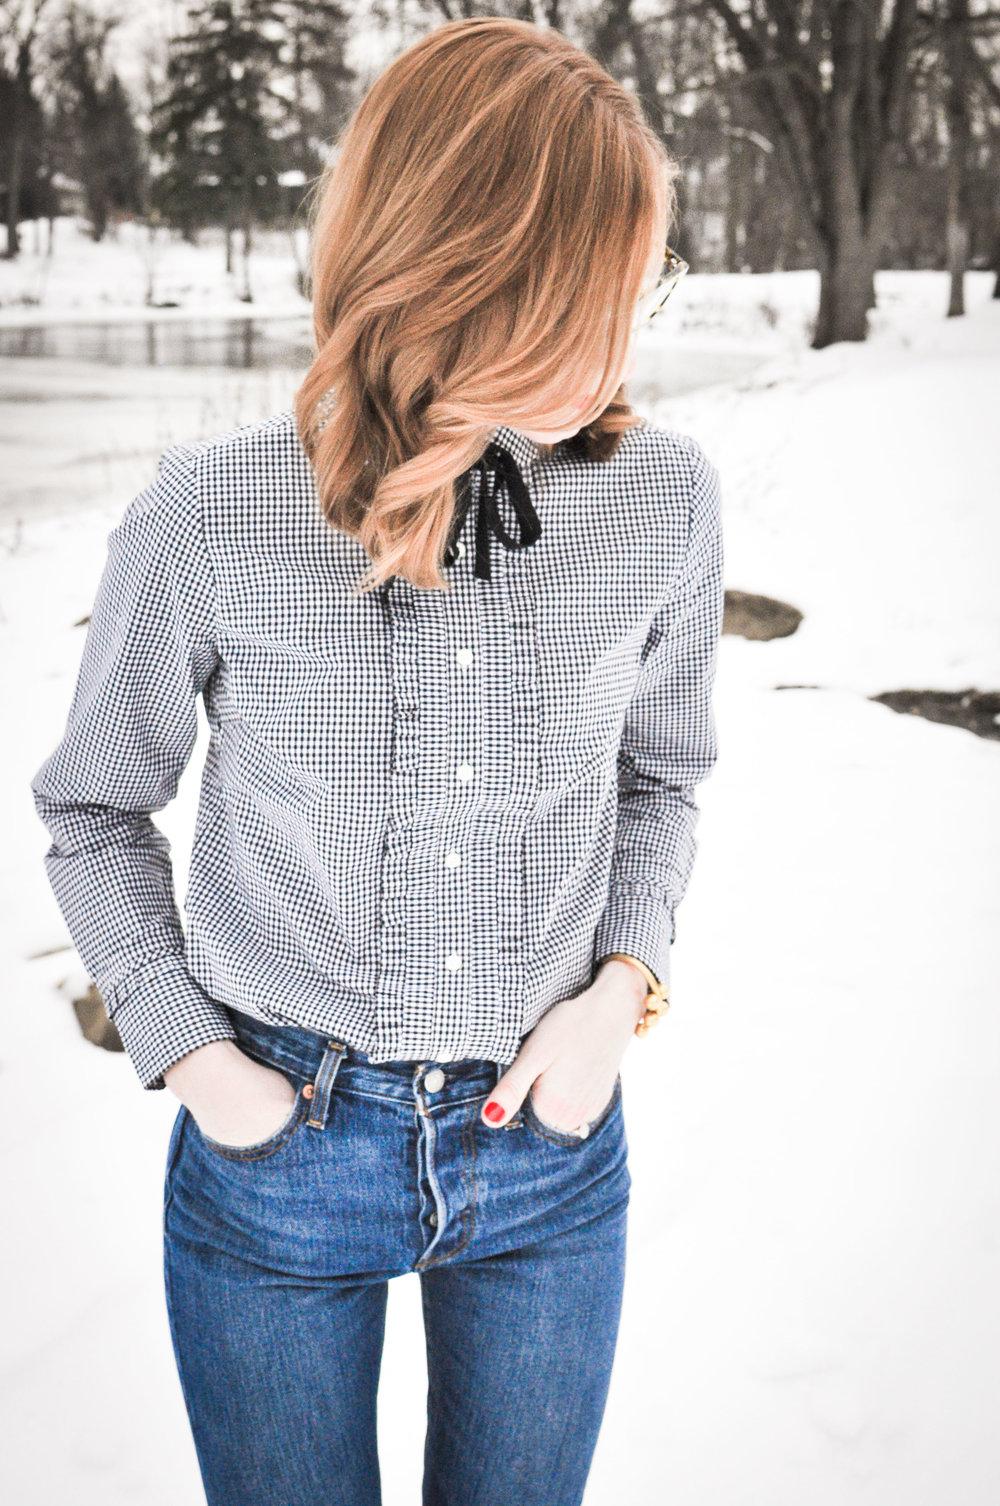 black-and-white-gingham-shirt.jpg